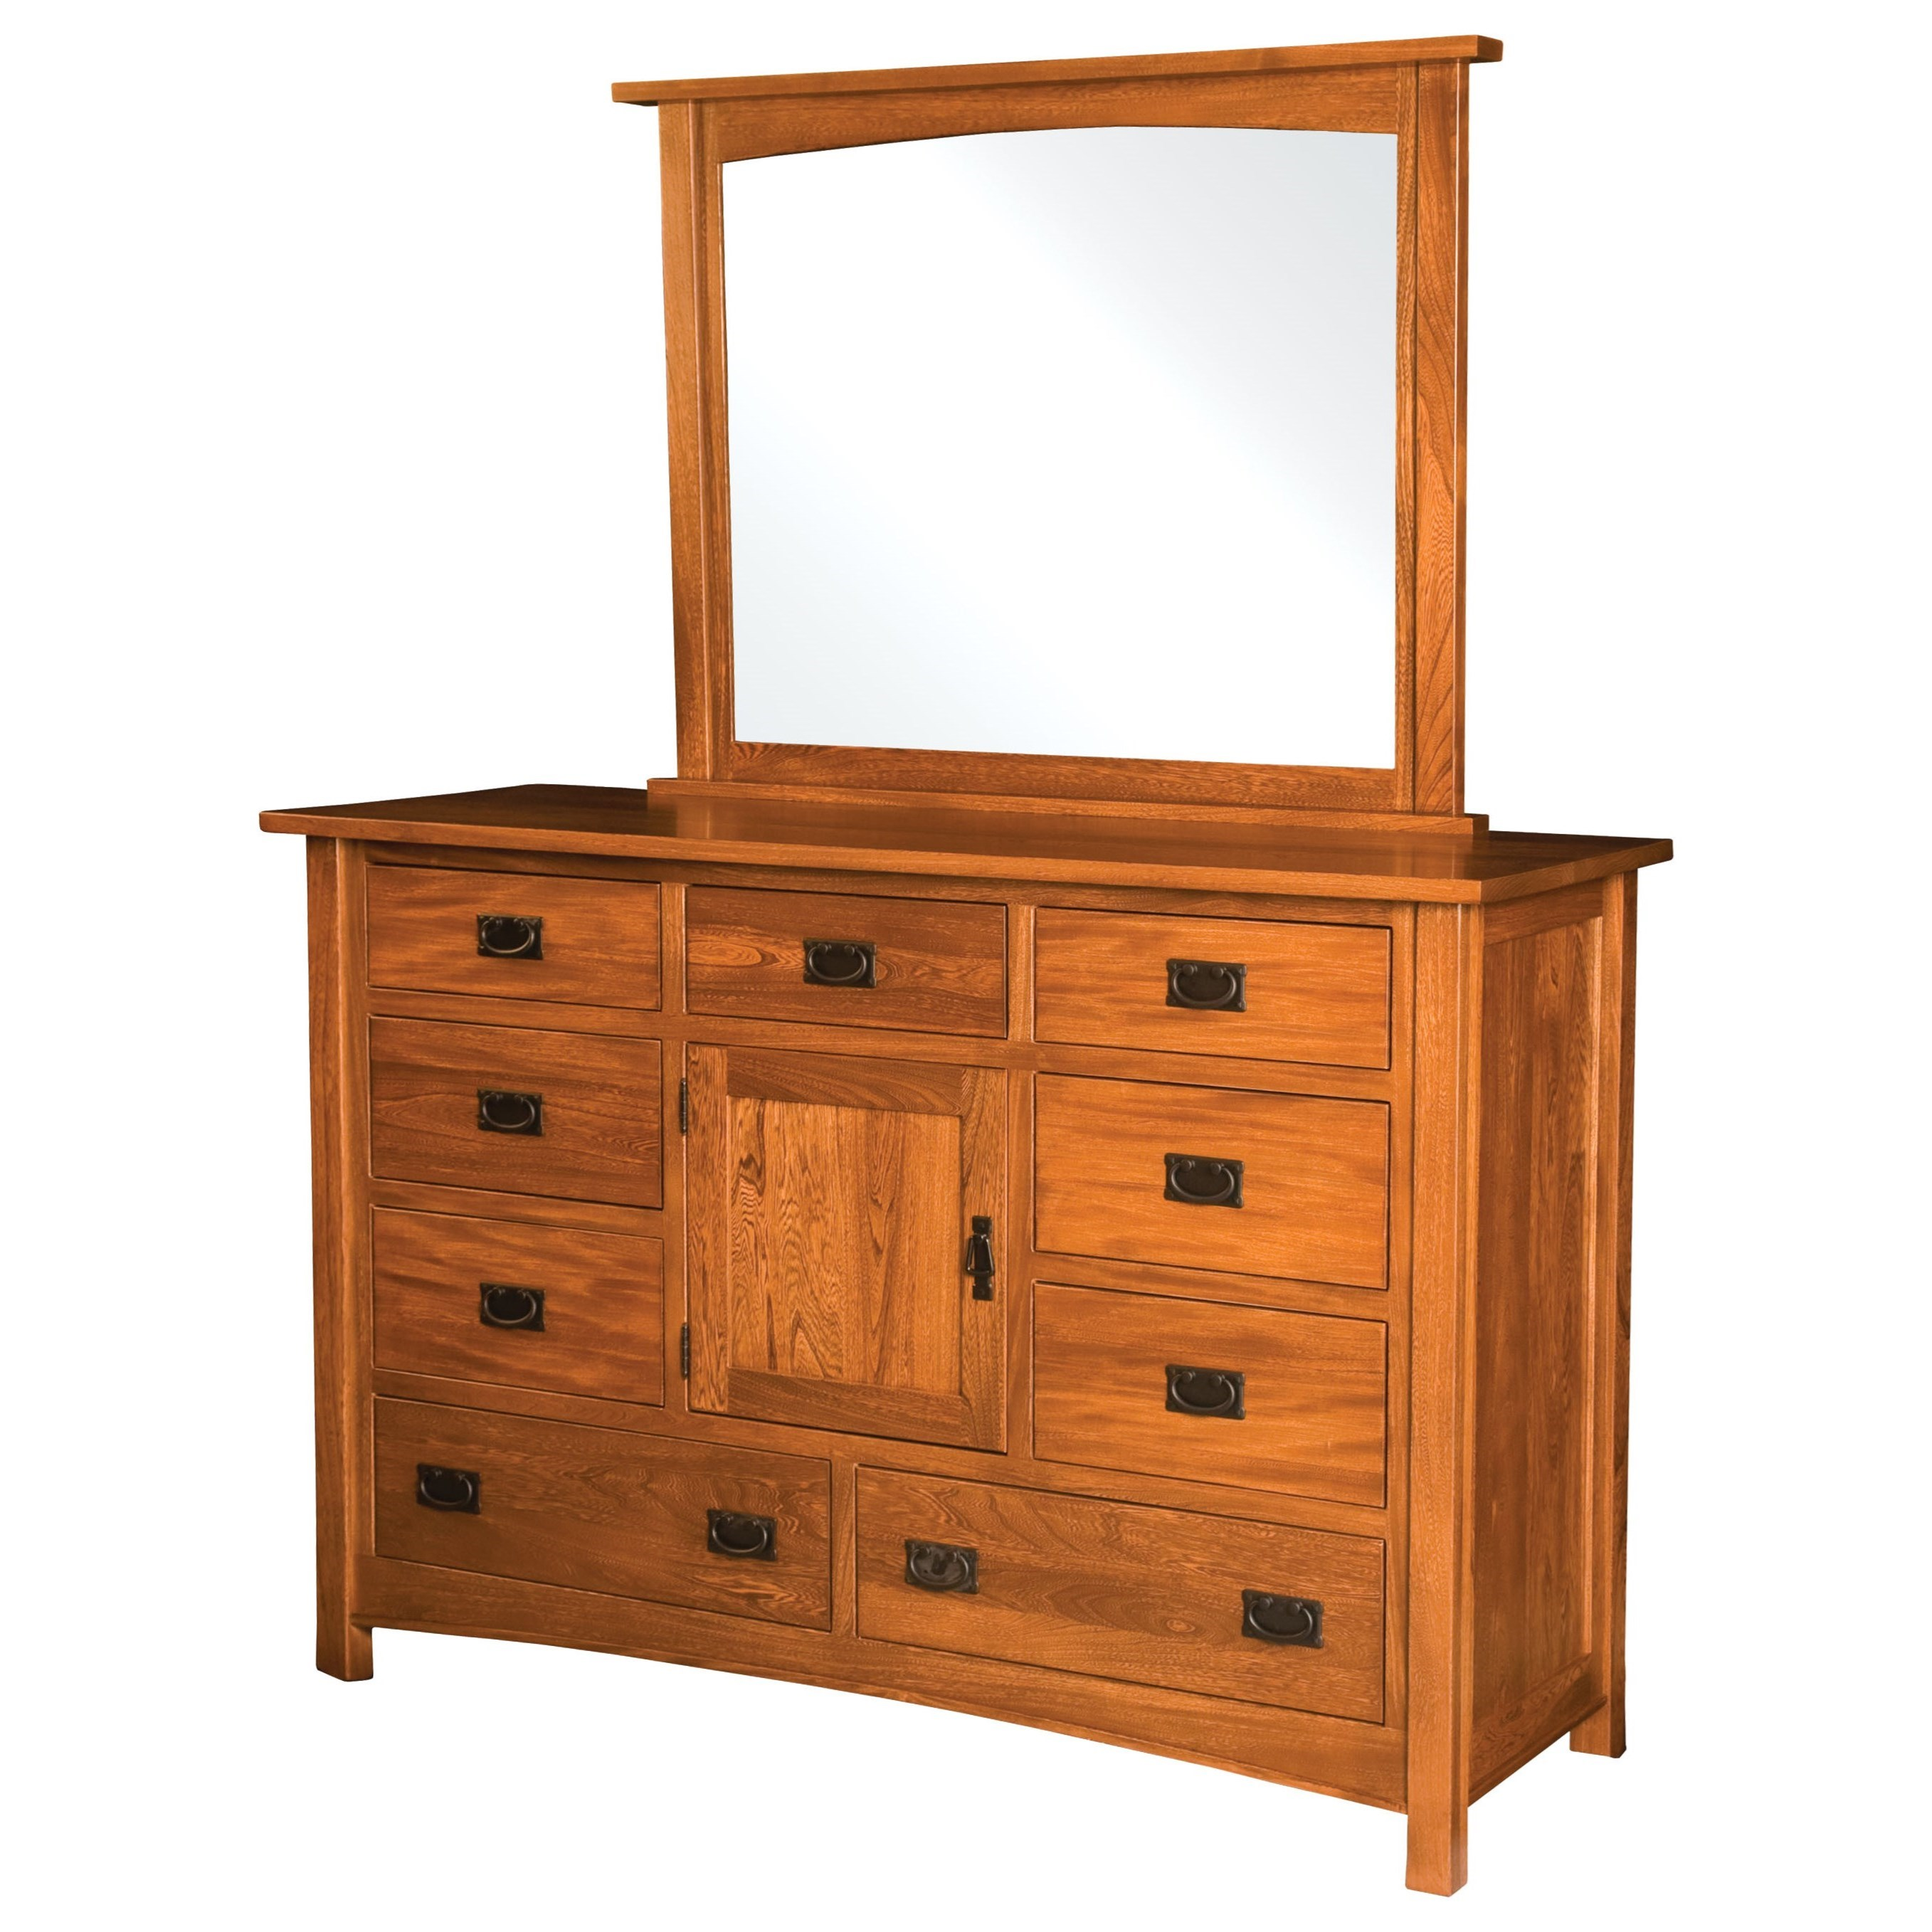 Brooklyn Mission 9 Drawer 1 Door Dresser by Brookside Furniture at Mueller Furniture